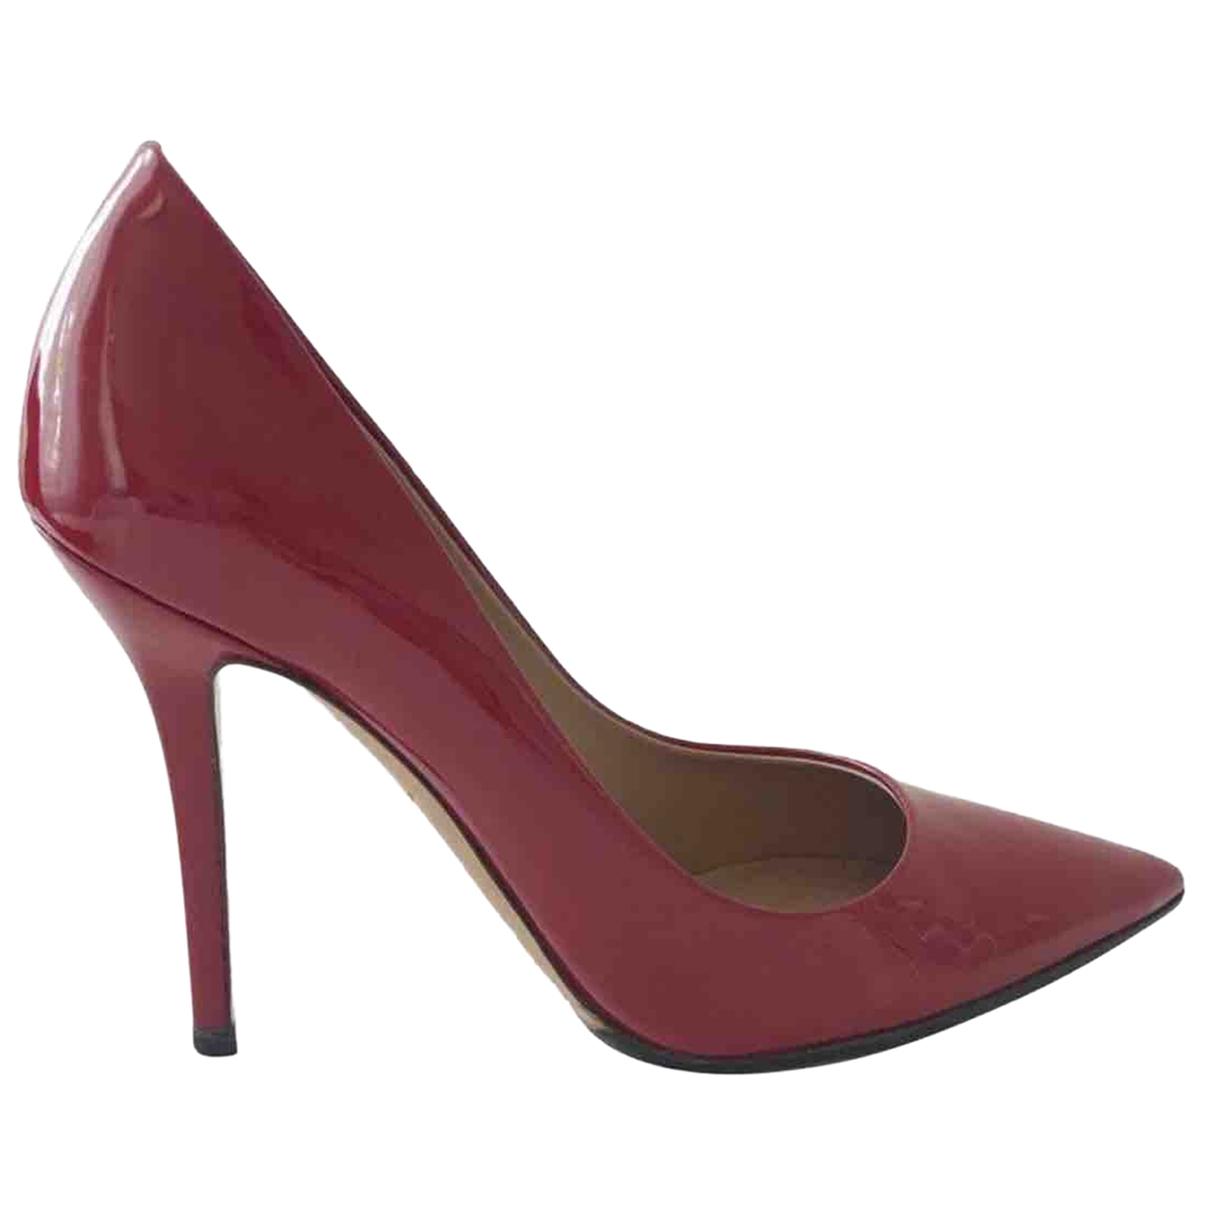 Salvatore Ferragamo \N Red Patent leather Heels for Women 37 EU